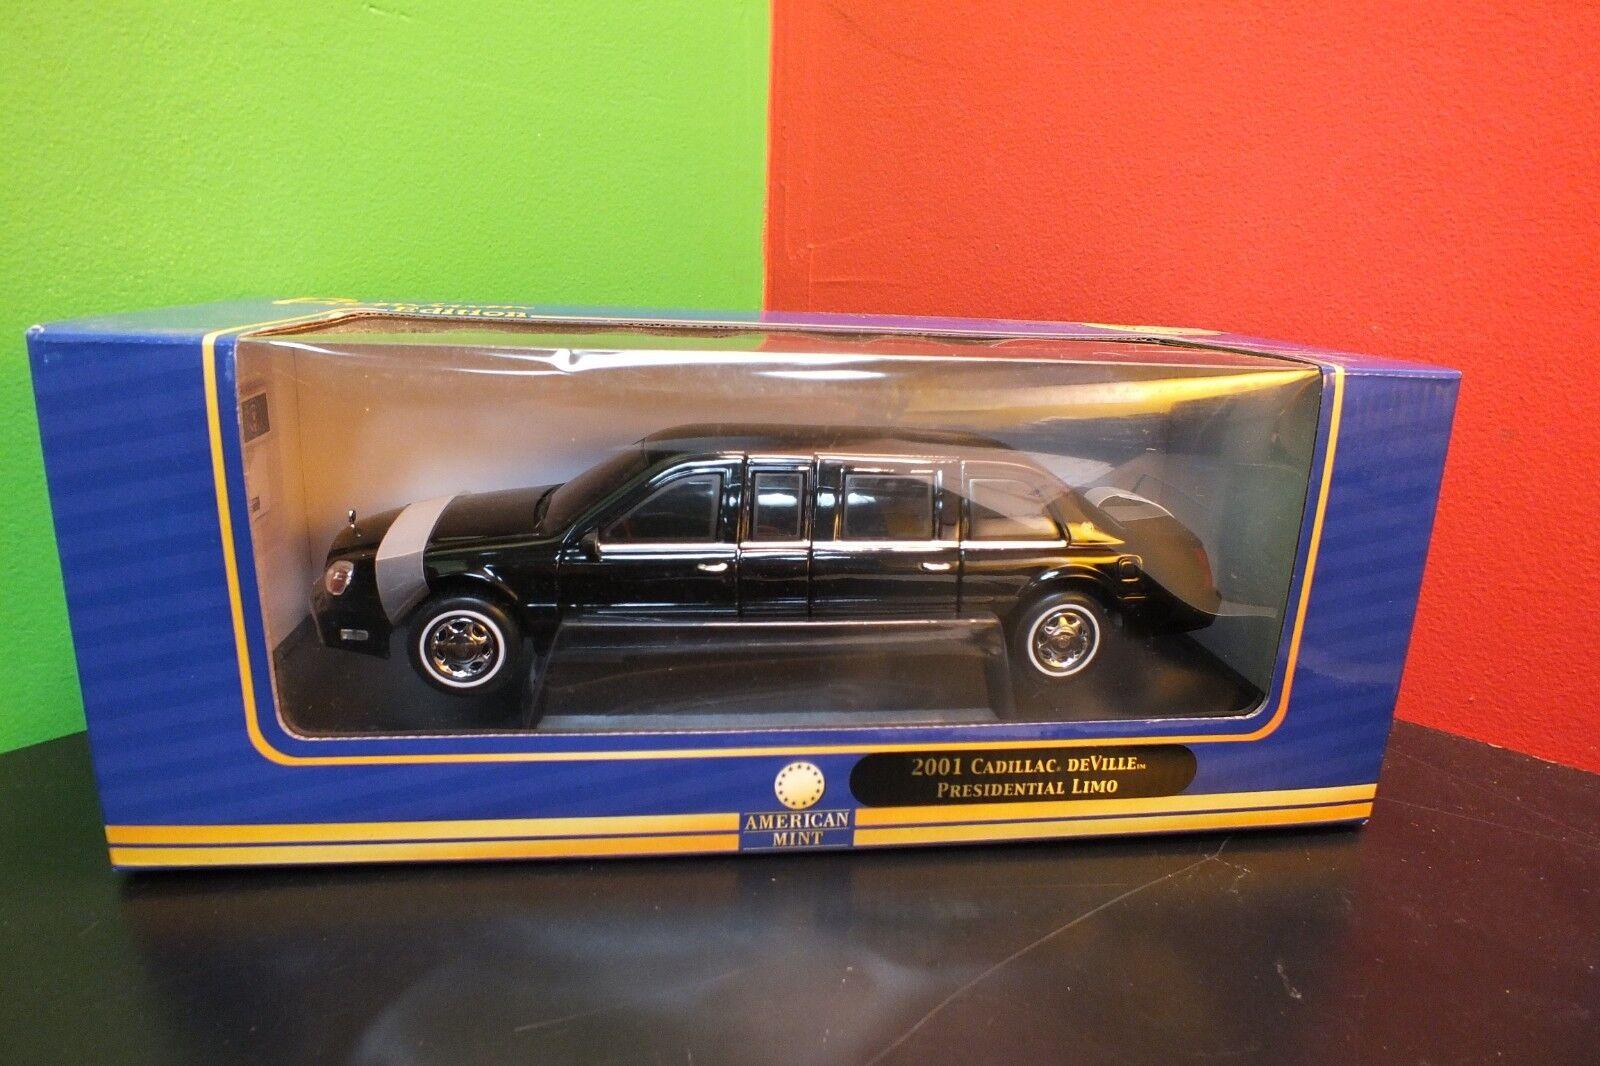 1 1 1 24 Scale 2001 Cadillac DeVille Presidential Limo Premium Edition American Mint 4c9711